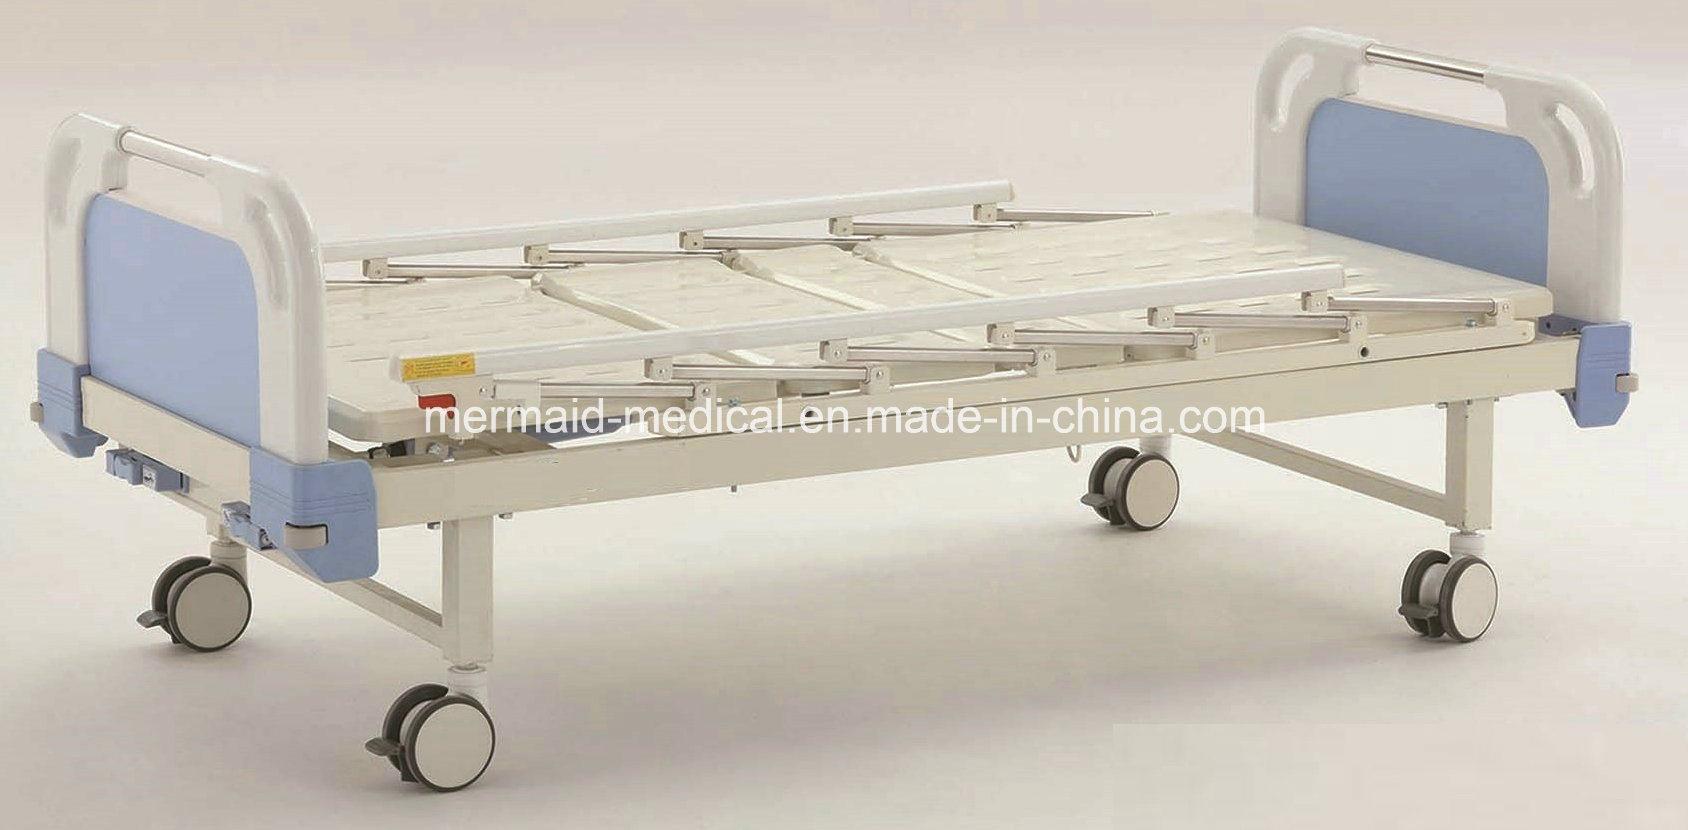 Medical Equipment B-11-1 Movable Full-Fowler Hospital Bed B-11-1 Ecom41